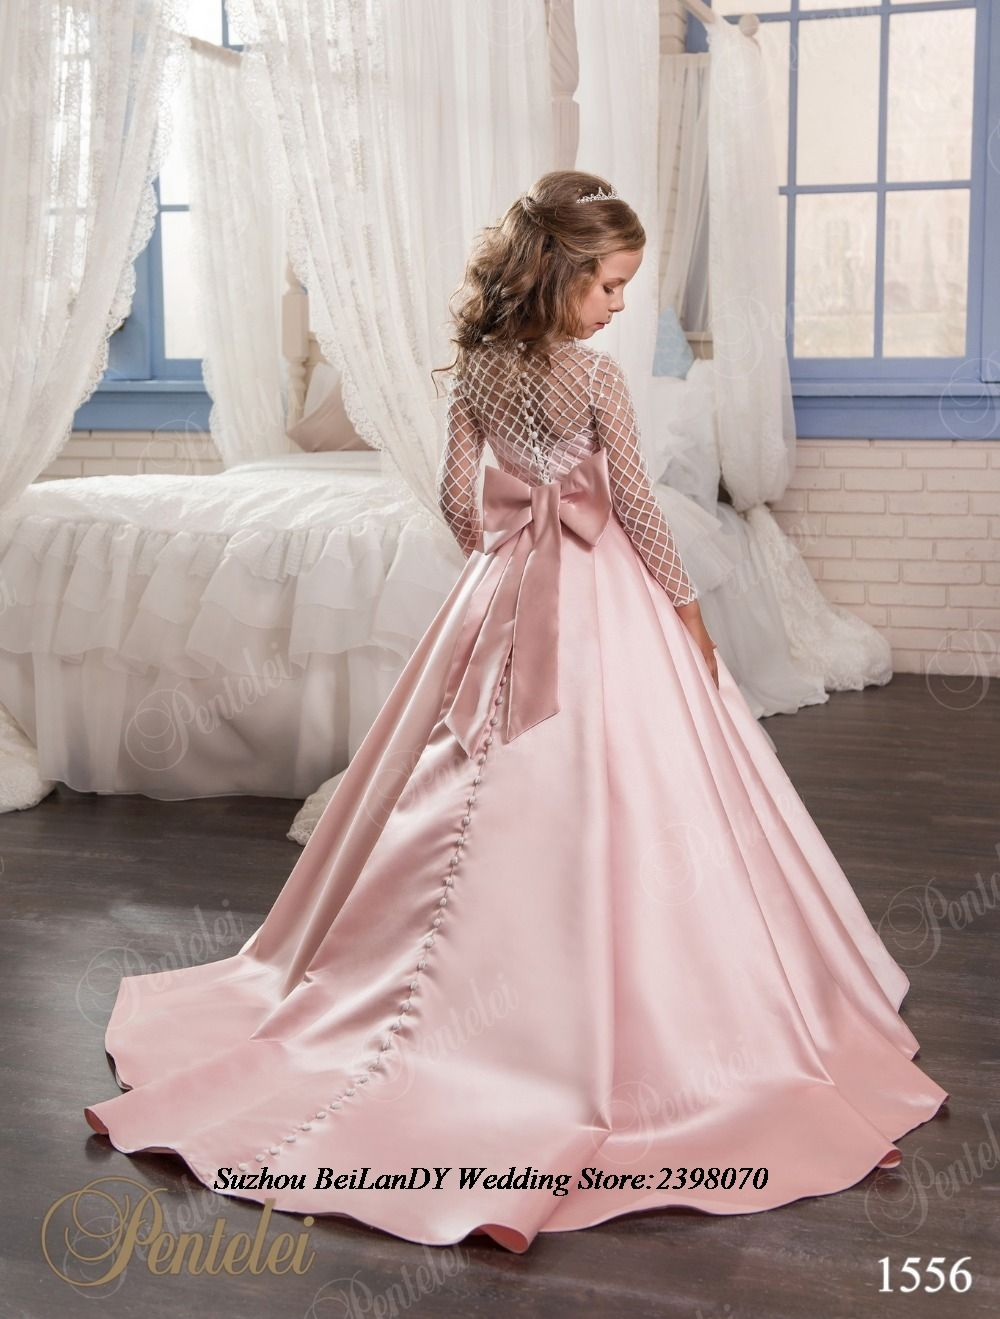 76ebba95c Elegant Pink Flower Girl Dress Satin kids First Communion with long ...